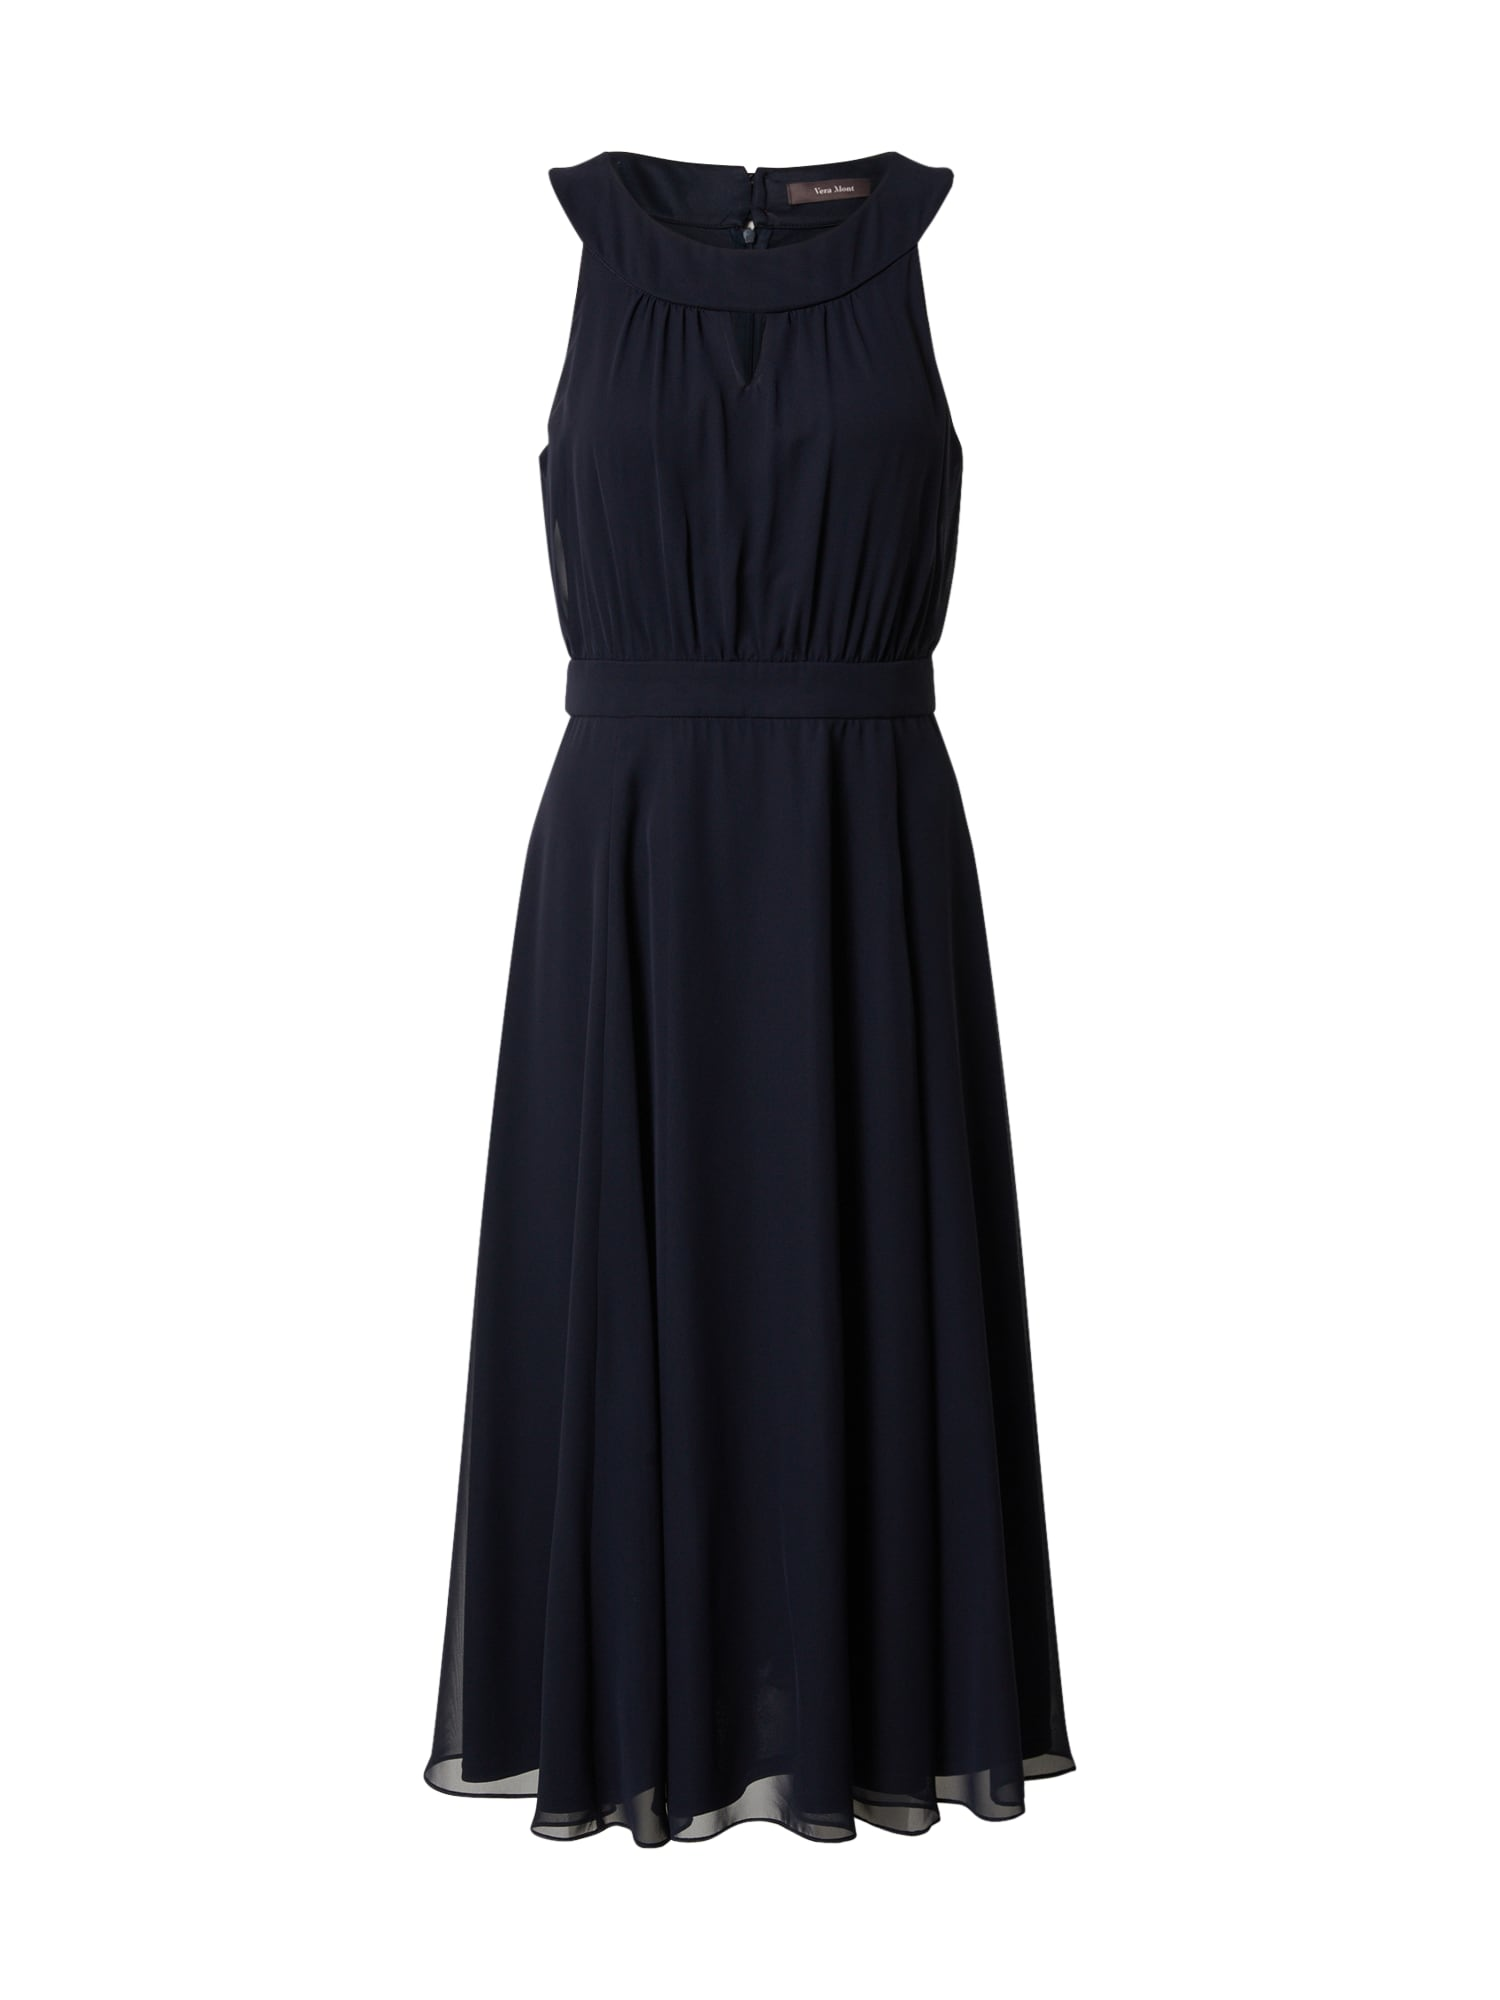 Vera Mont Suknelė nakties mėlyna